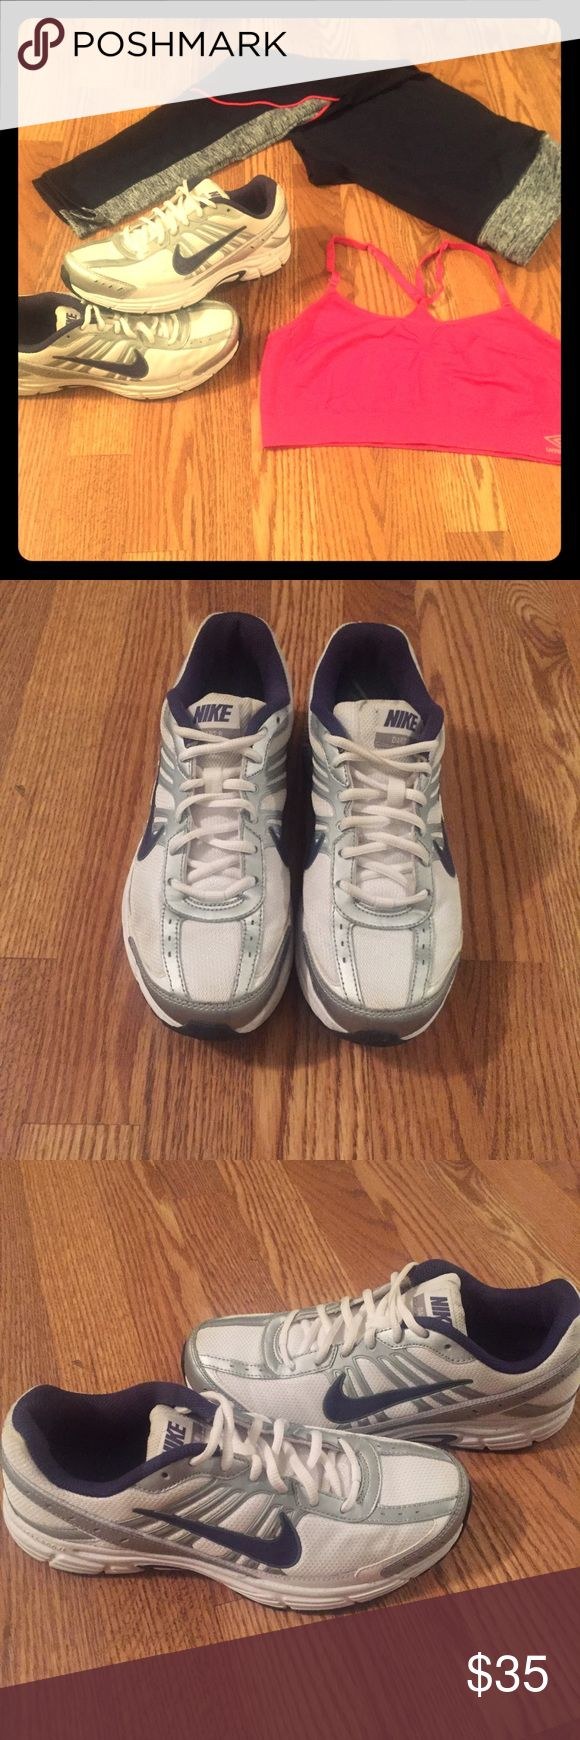 🏃🏻♀️Nike Dart 8 Women's Running Sneakers like new, no box Nike Shoes Sneakers